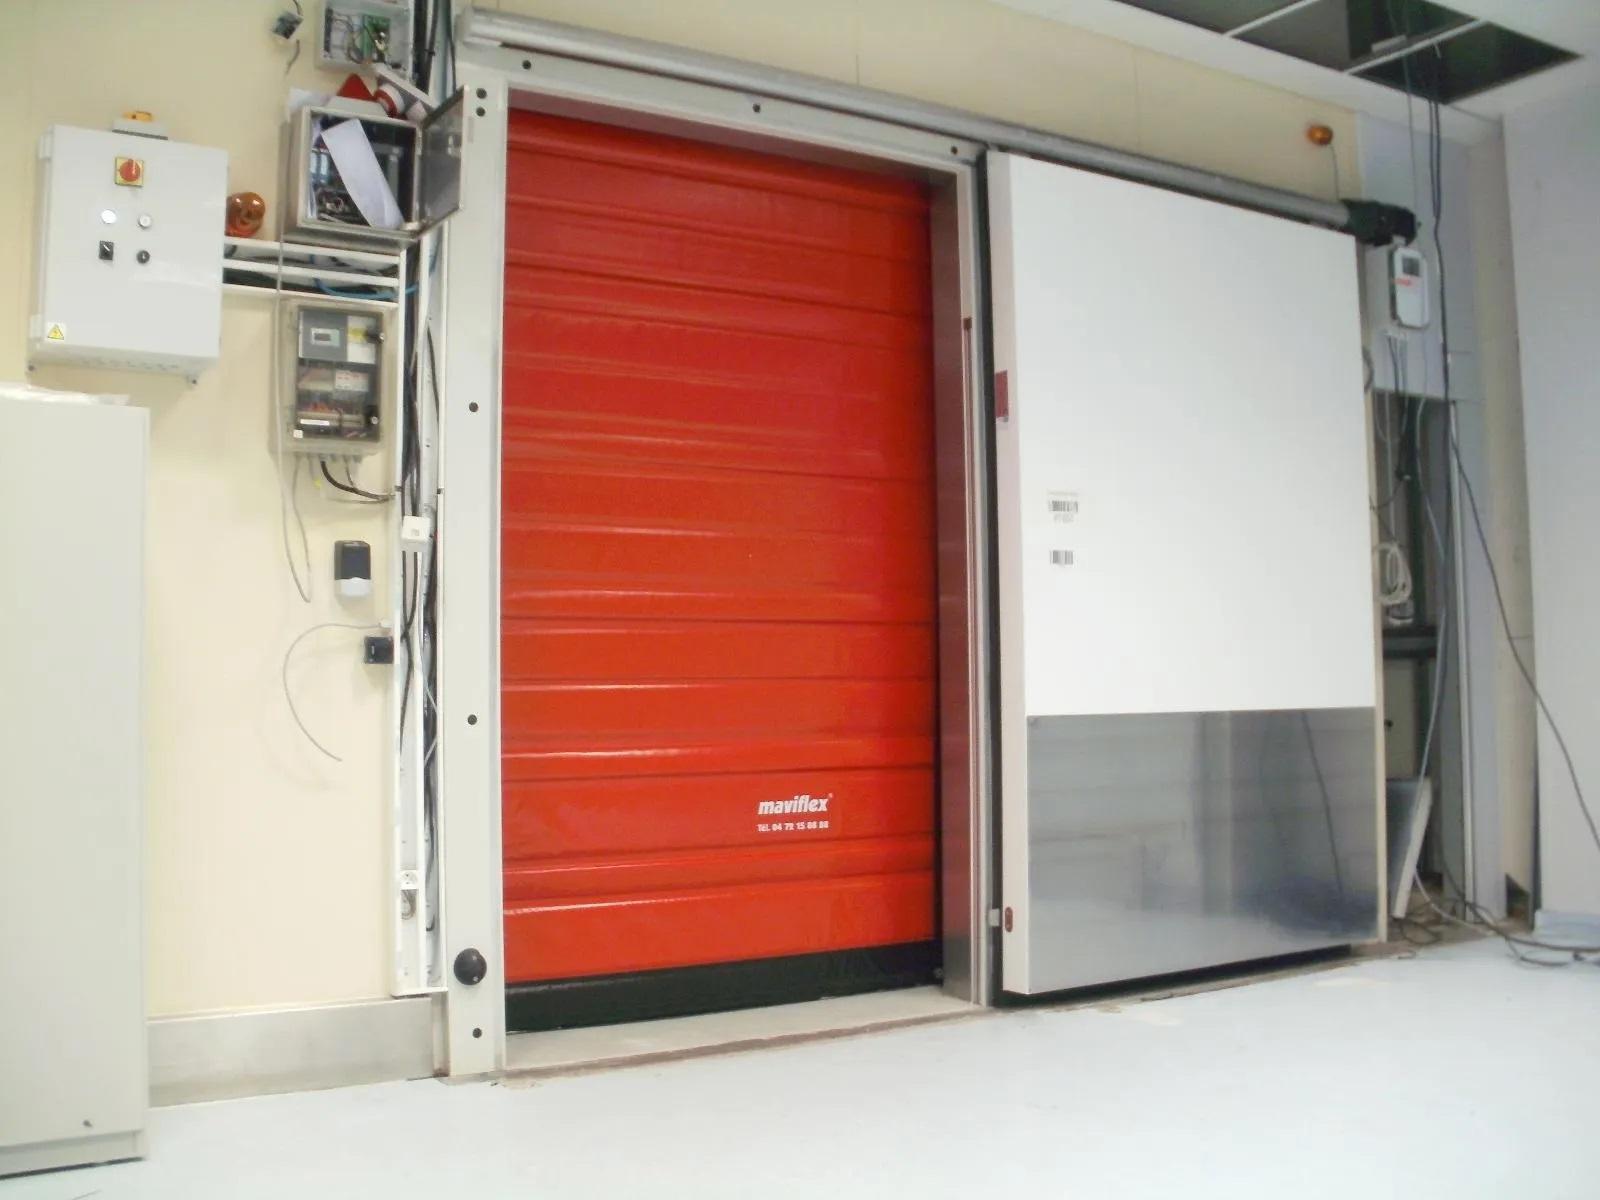 Installation et isolation de salle blanche à Wasselonne │ ISOMAT